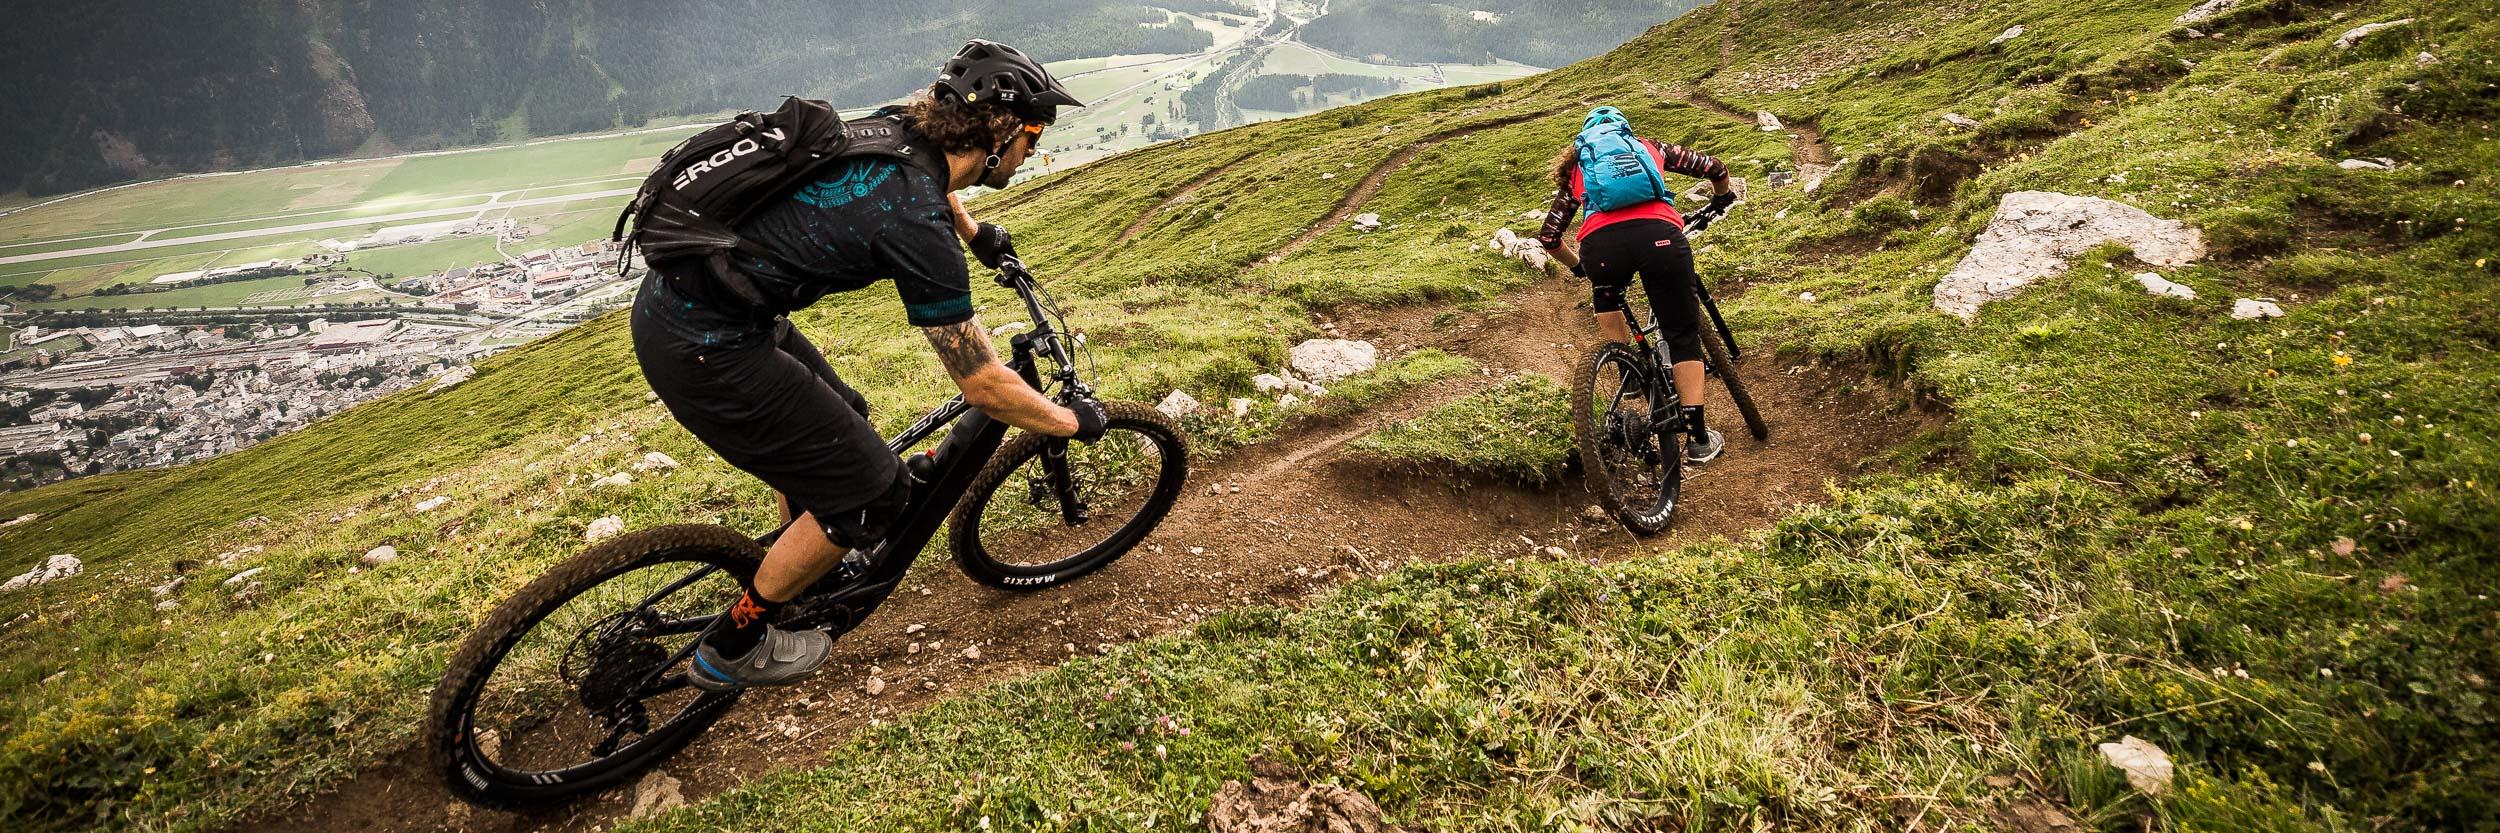 Mountain bike tours - meet your guide Dave